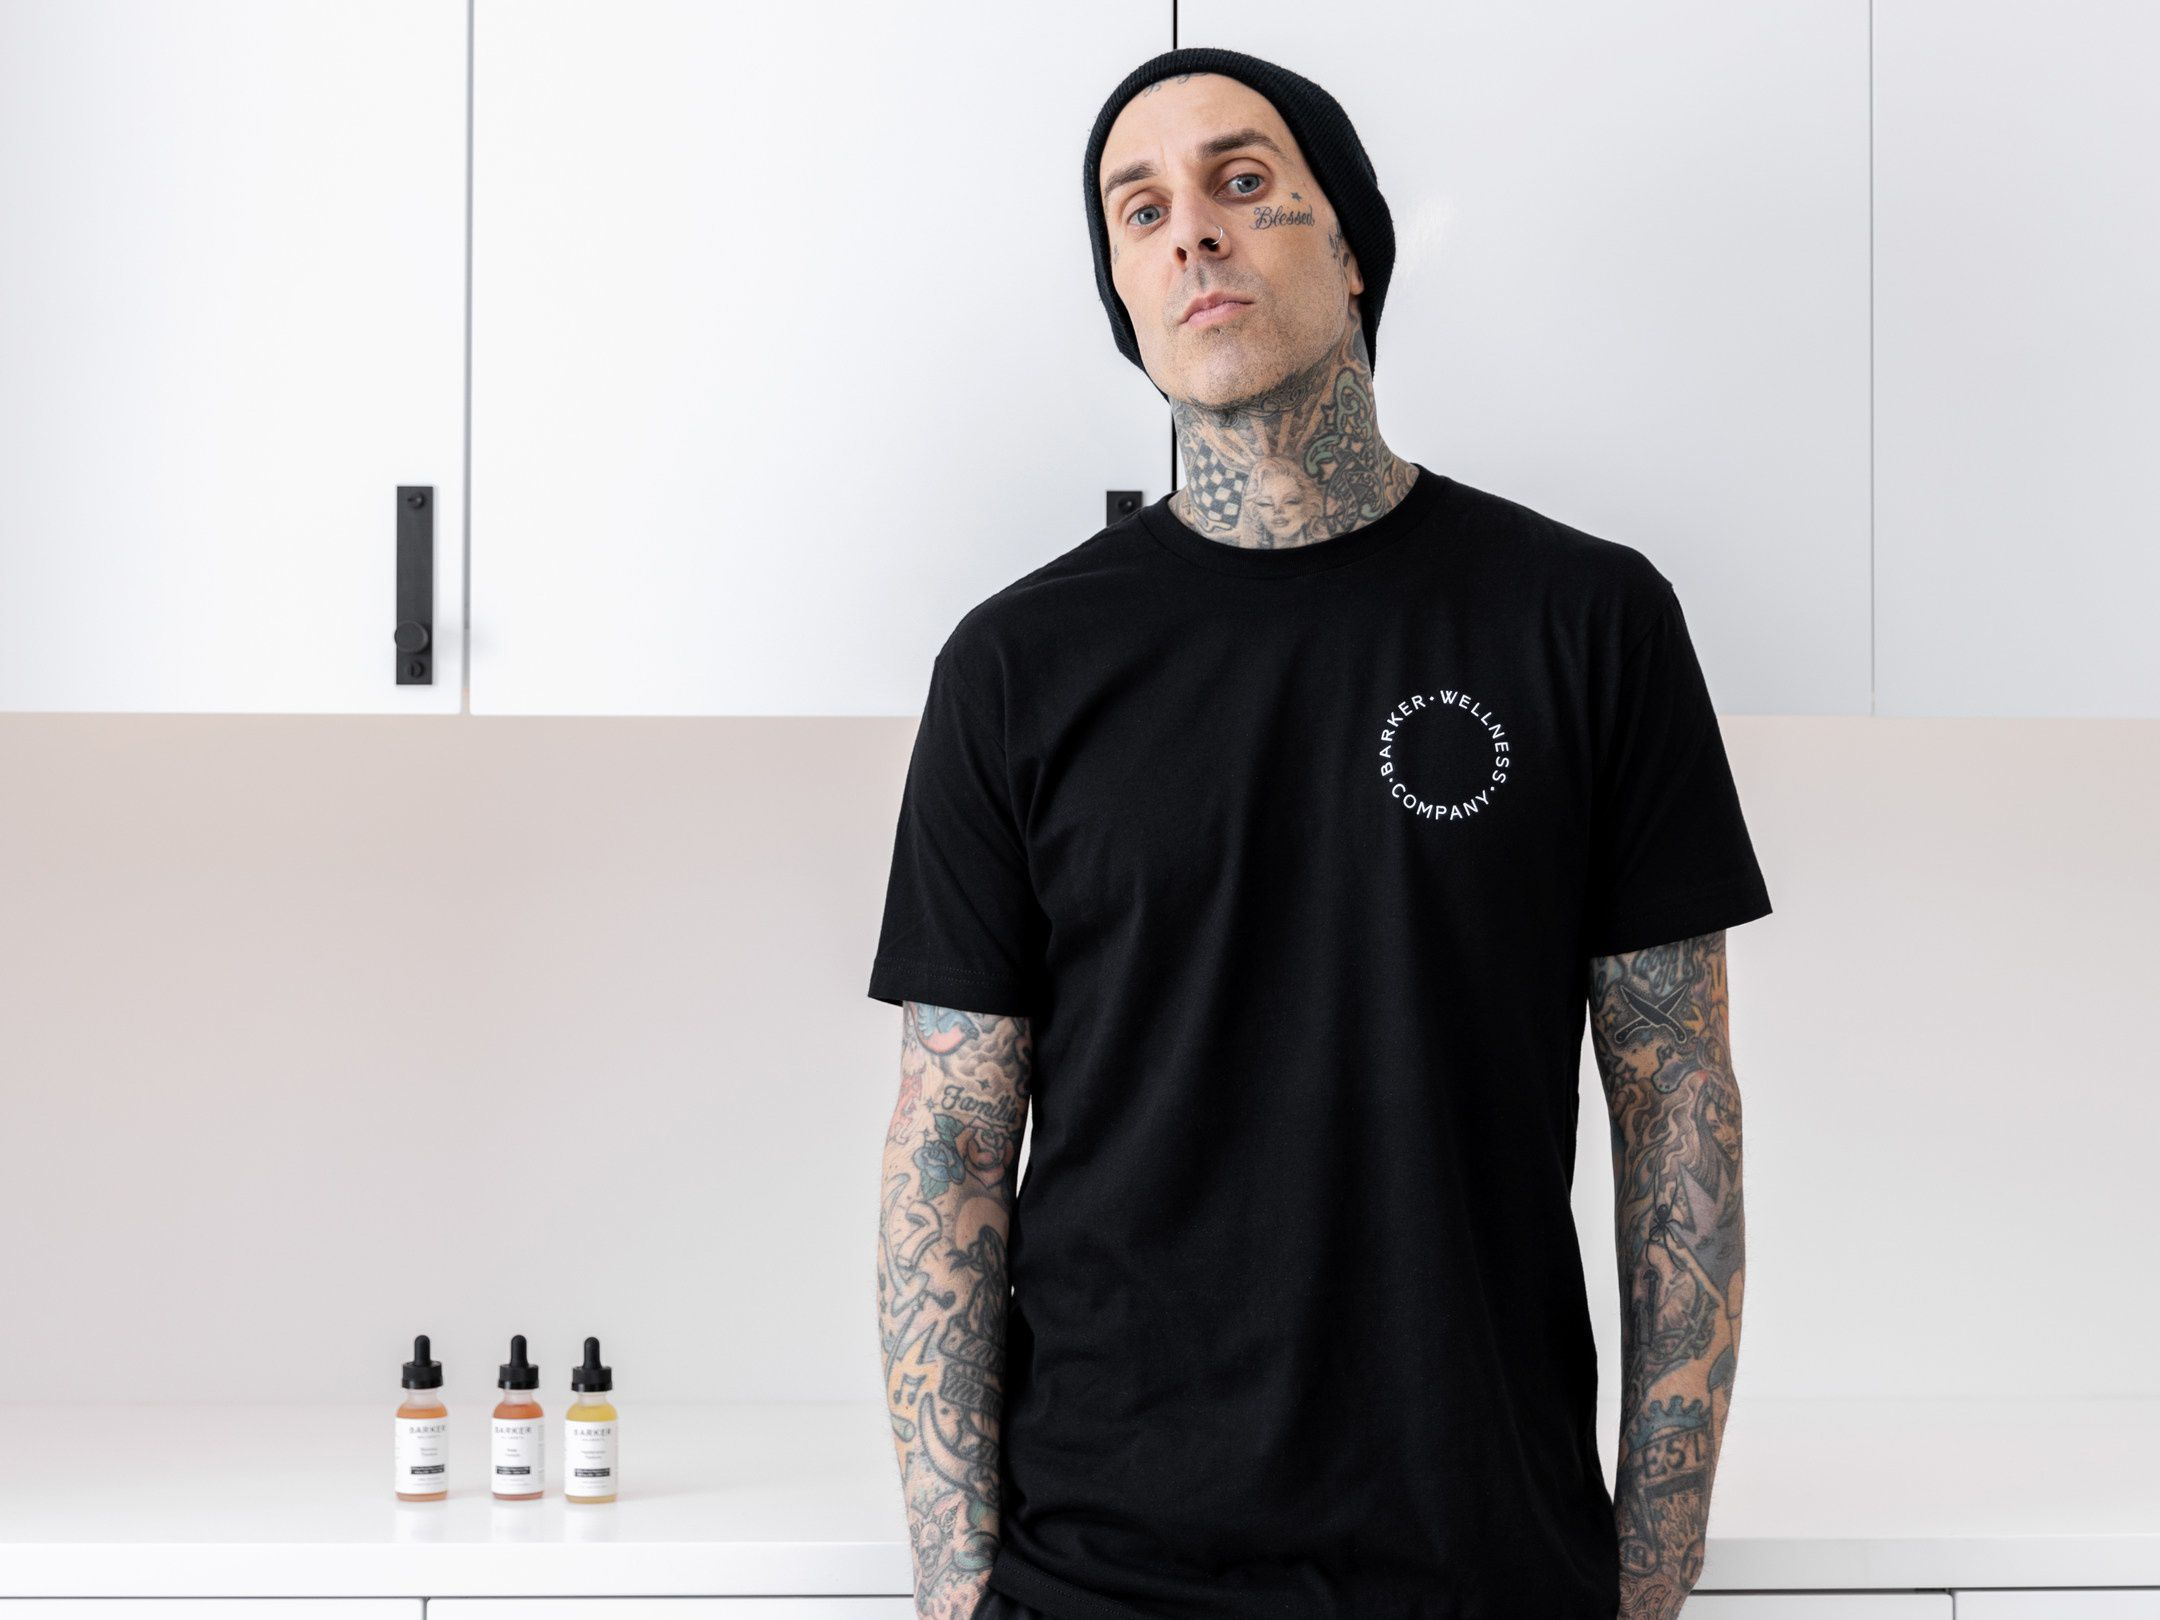 Travis Barker launches THC-free vegan wellness brand